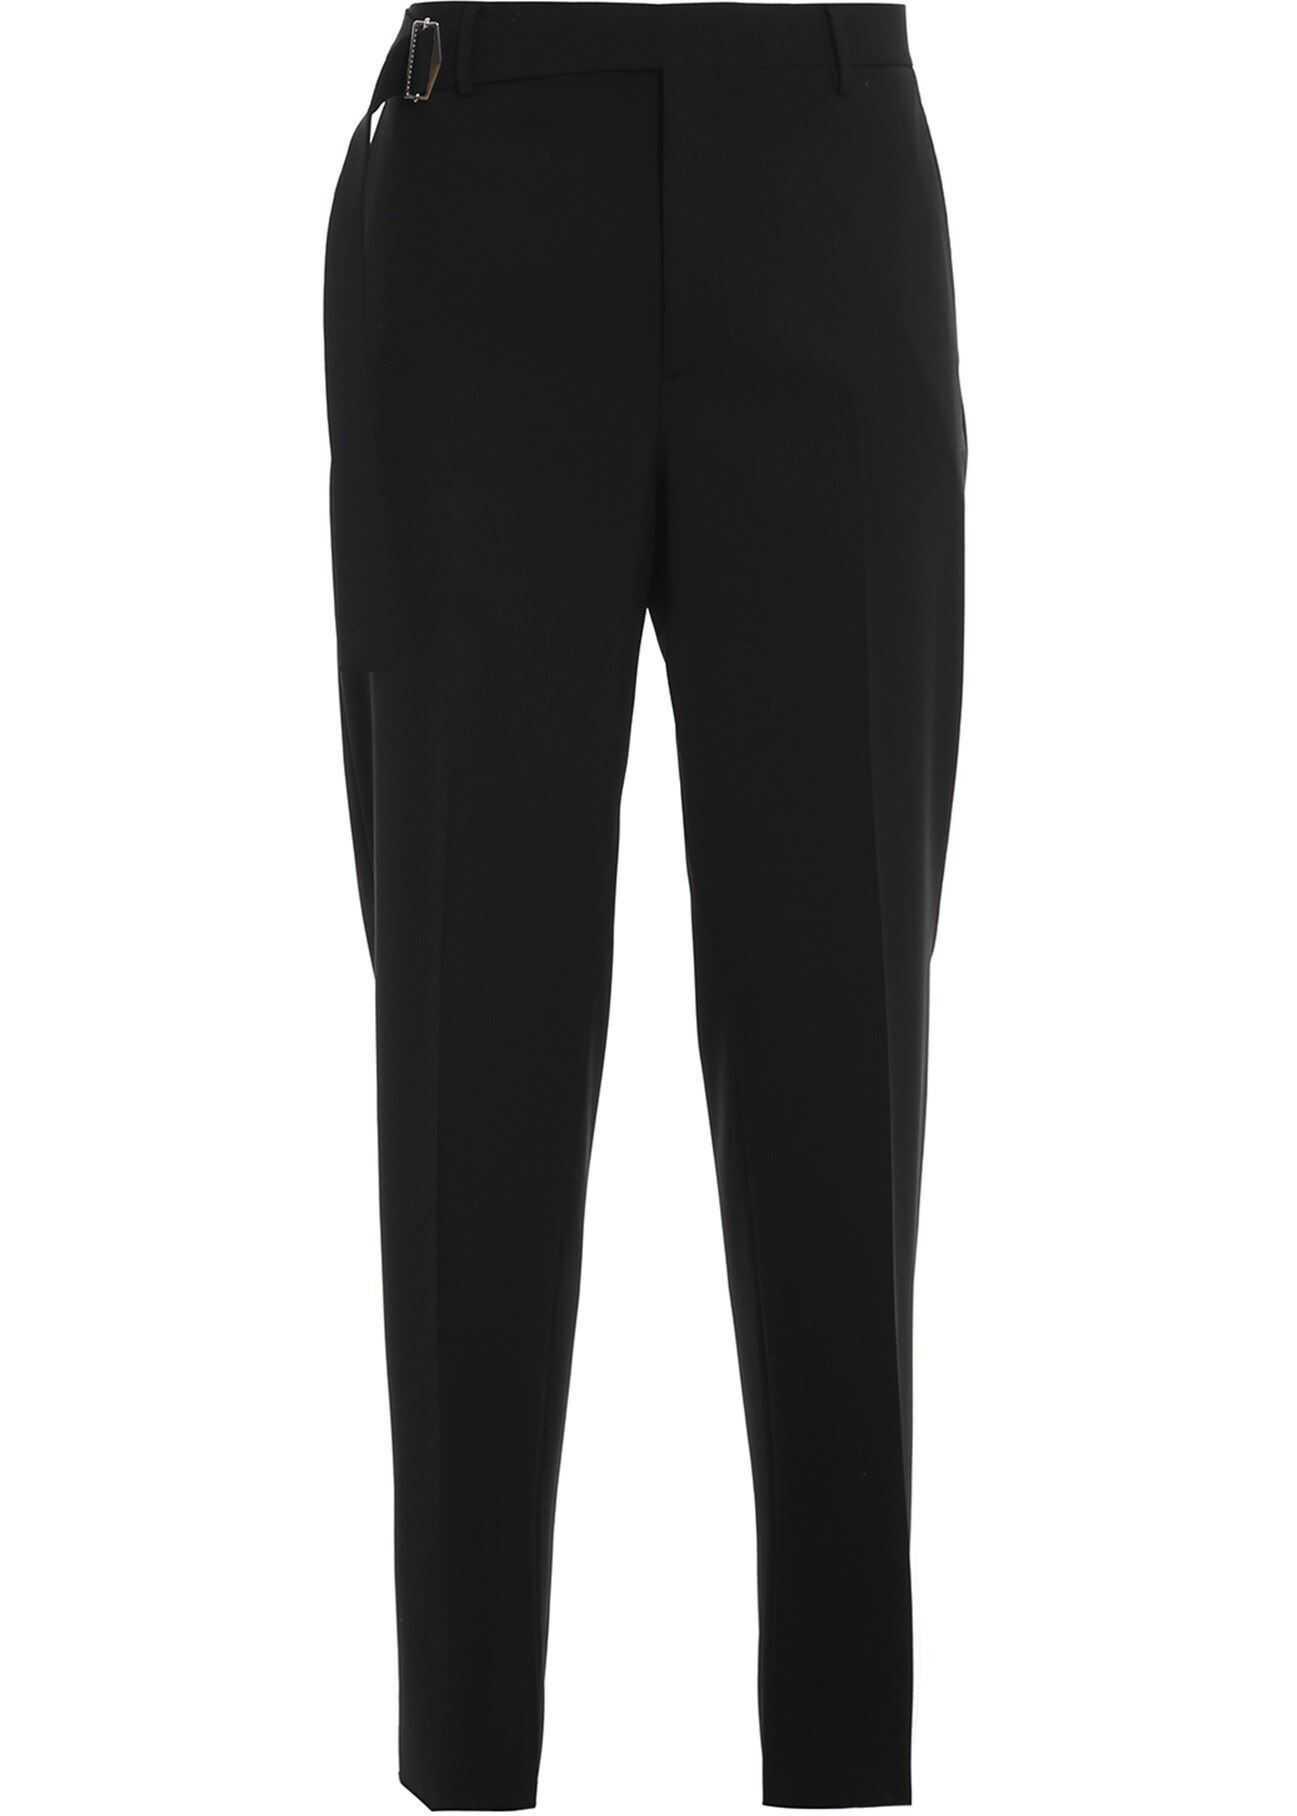 Valentino Garavani Wool Blend Pants In Black Black imagine